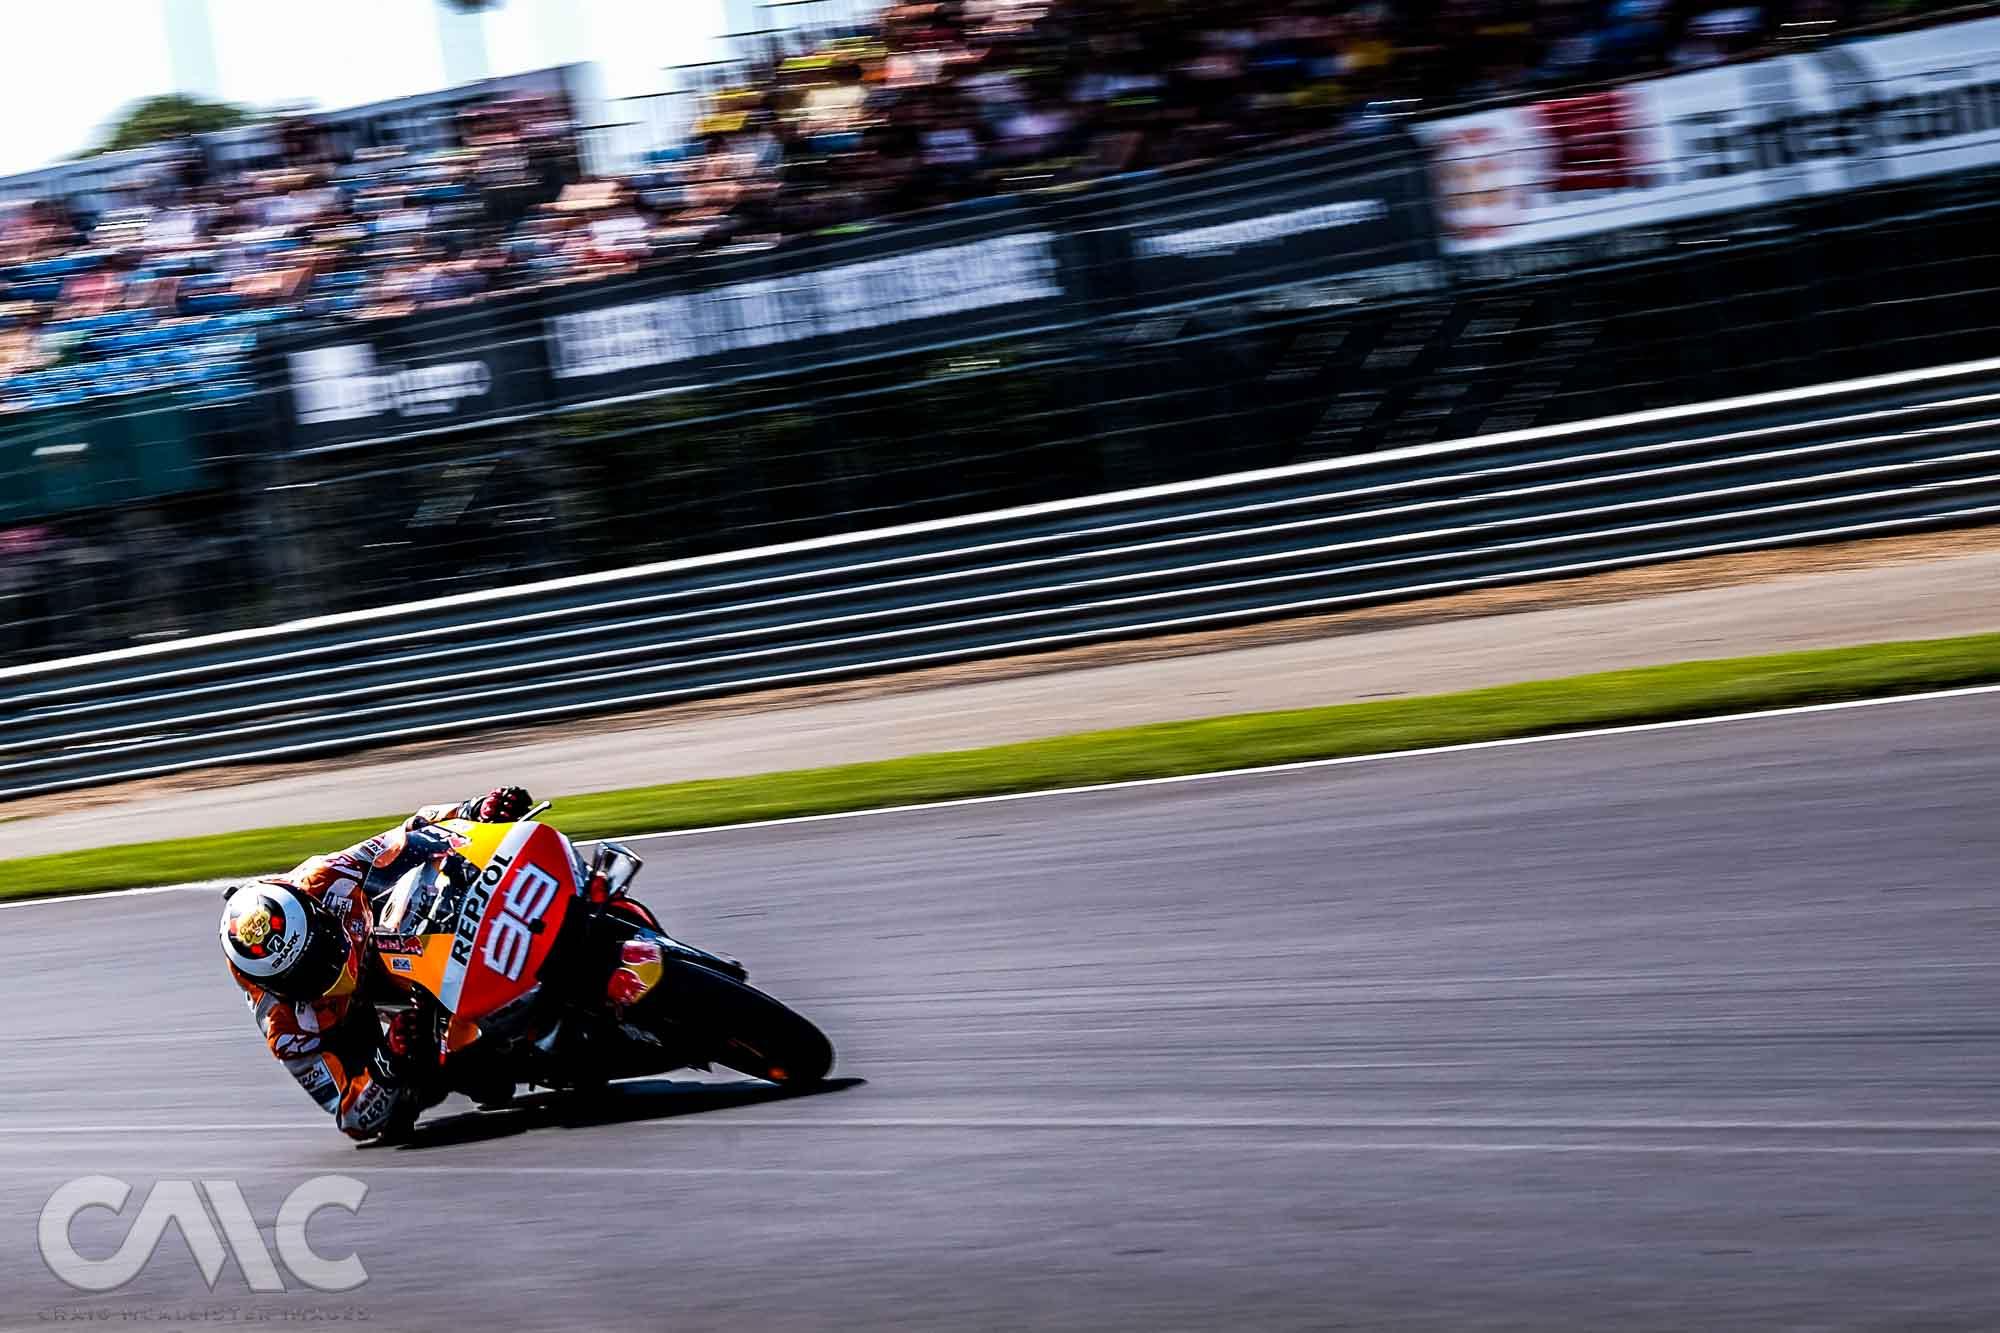 CMC_MotoGP_Qualifying_Silverstone 50-1405311.jpg